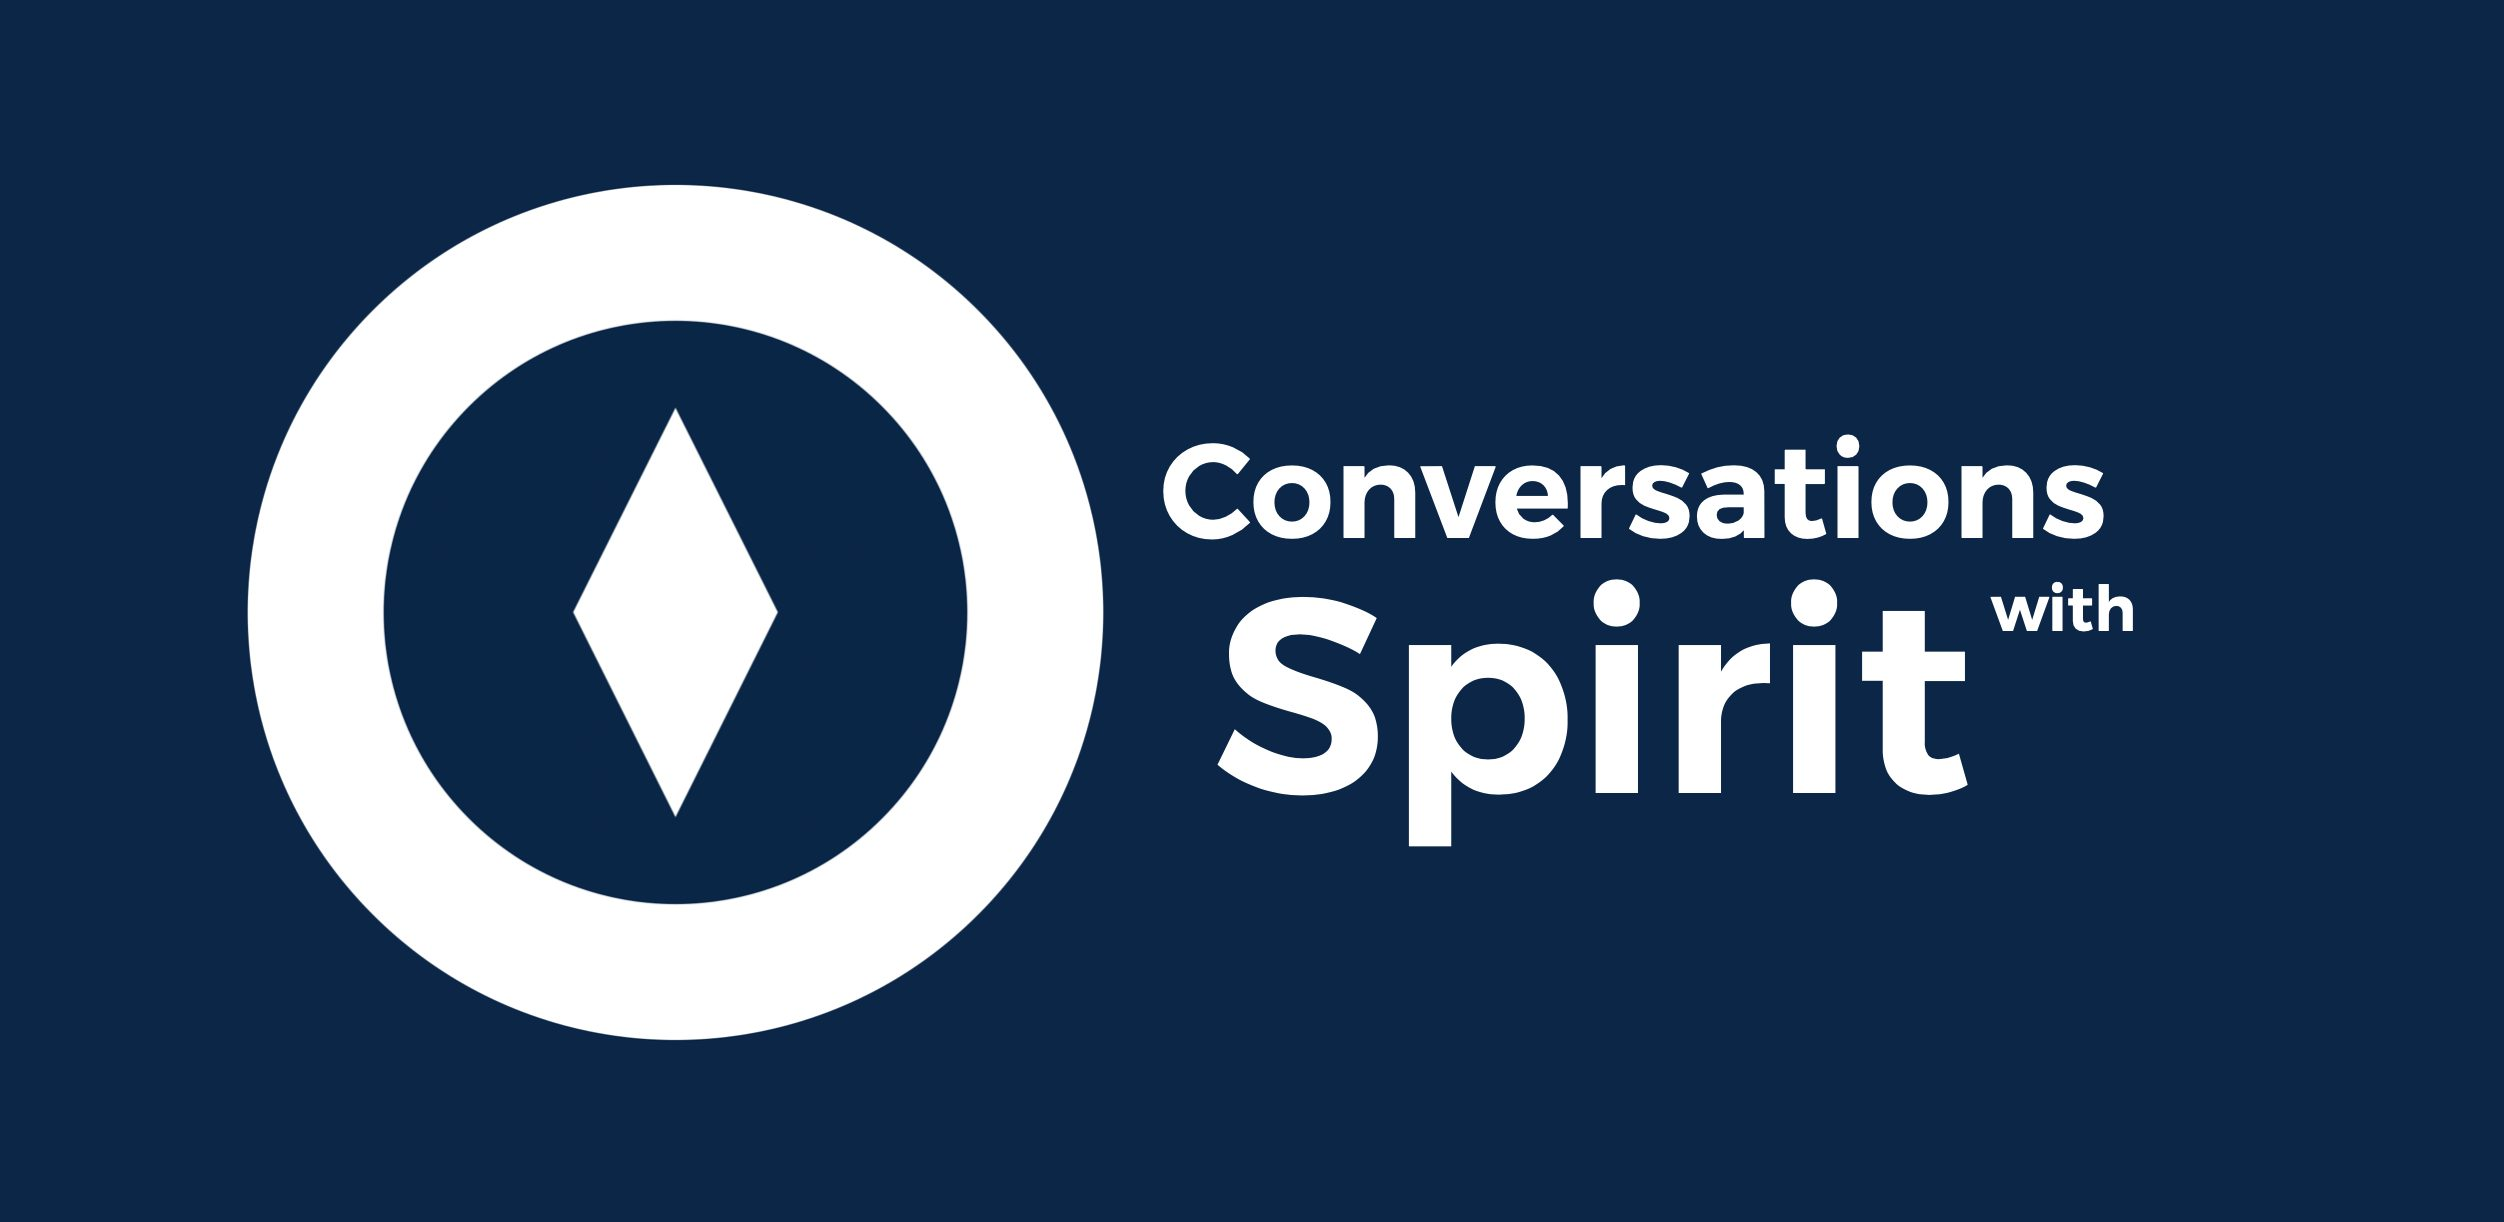 Conversations with Spirit